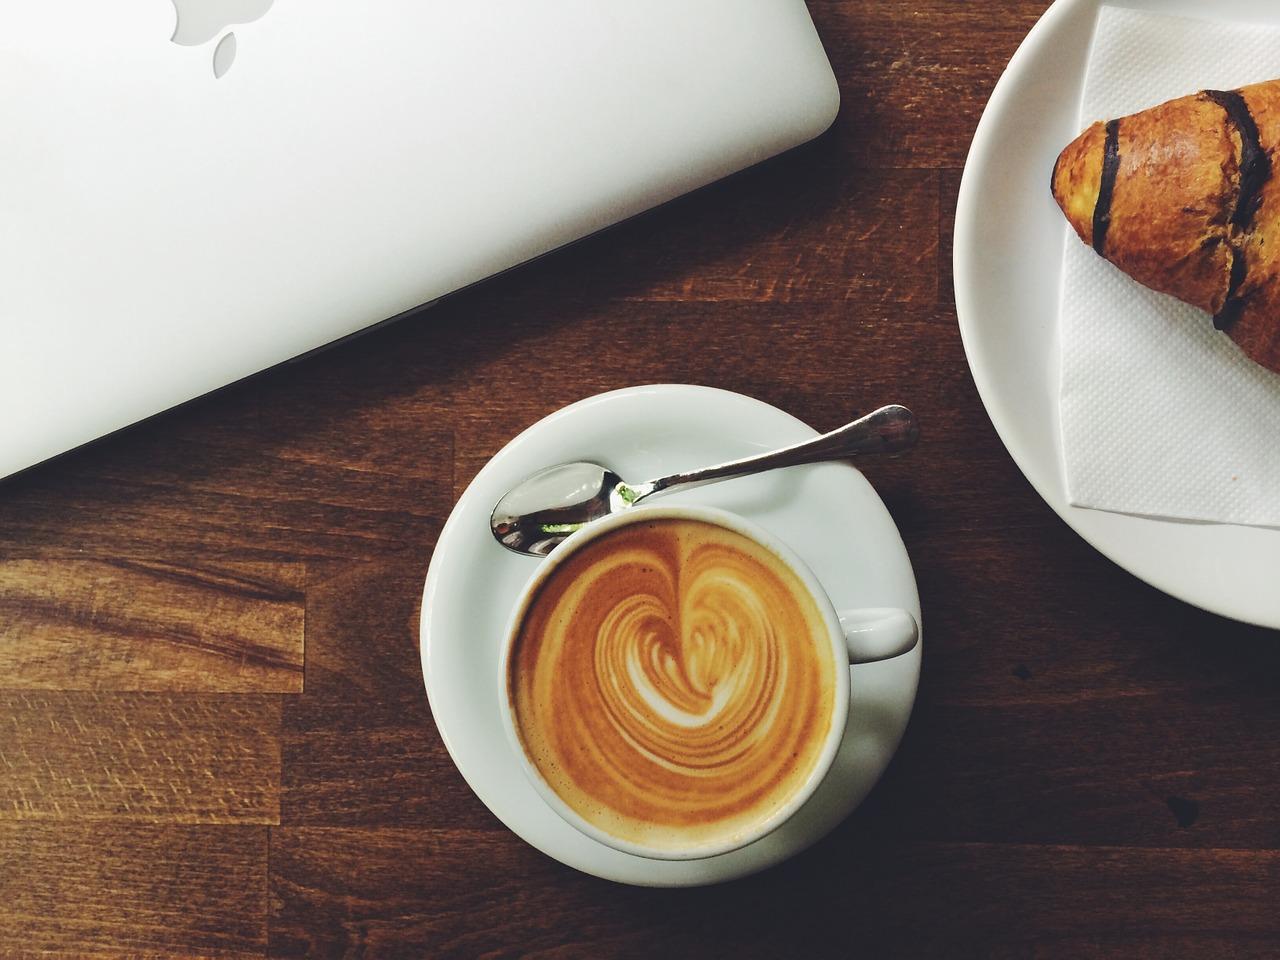 coffee-1031526_1280.jpg